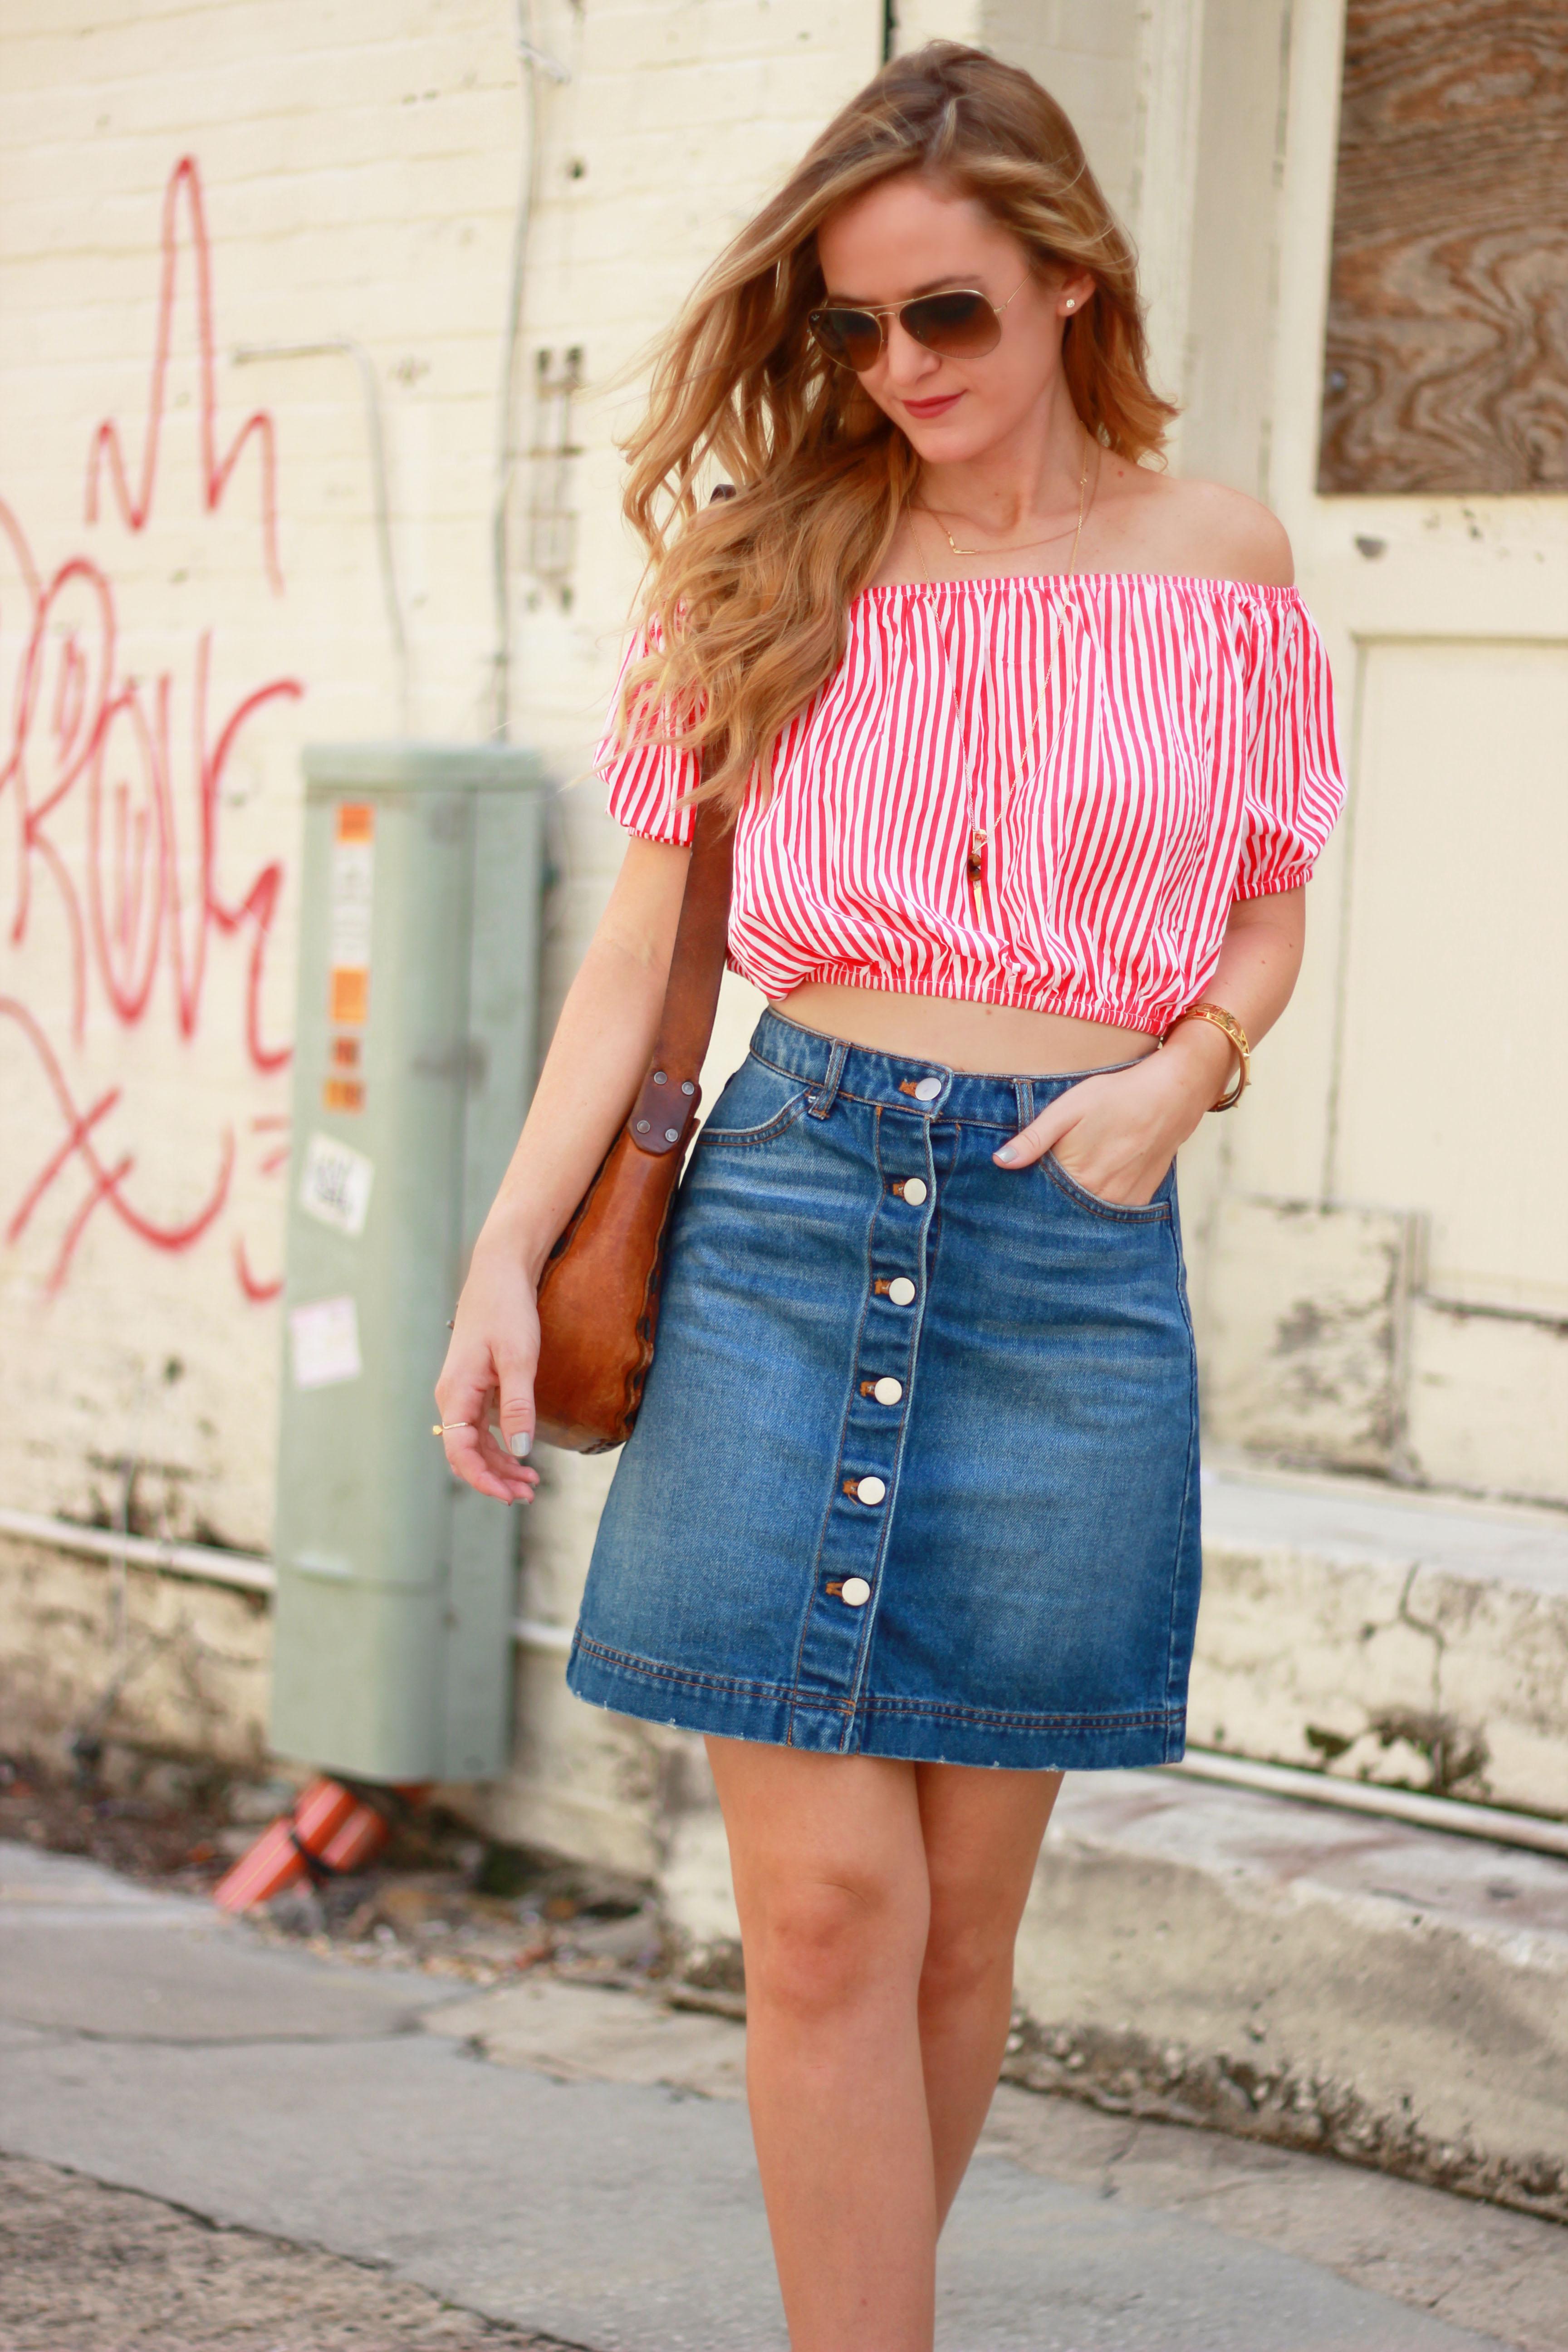 a9e27fd2c9 Denim Skirt And Top – DACC